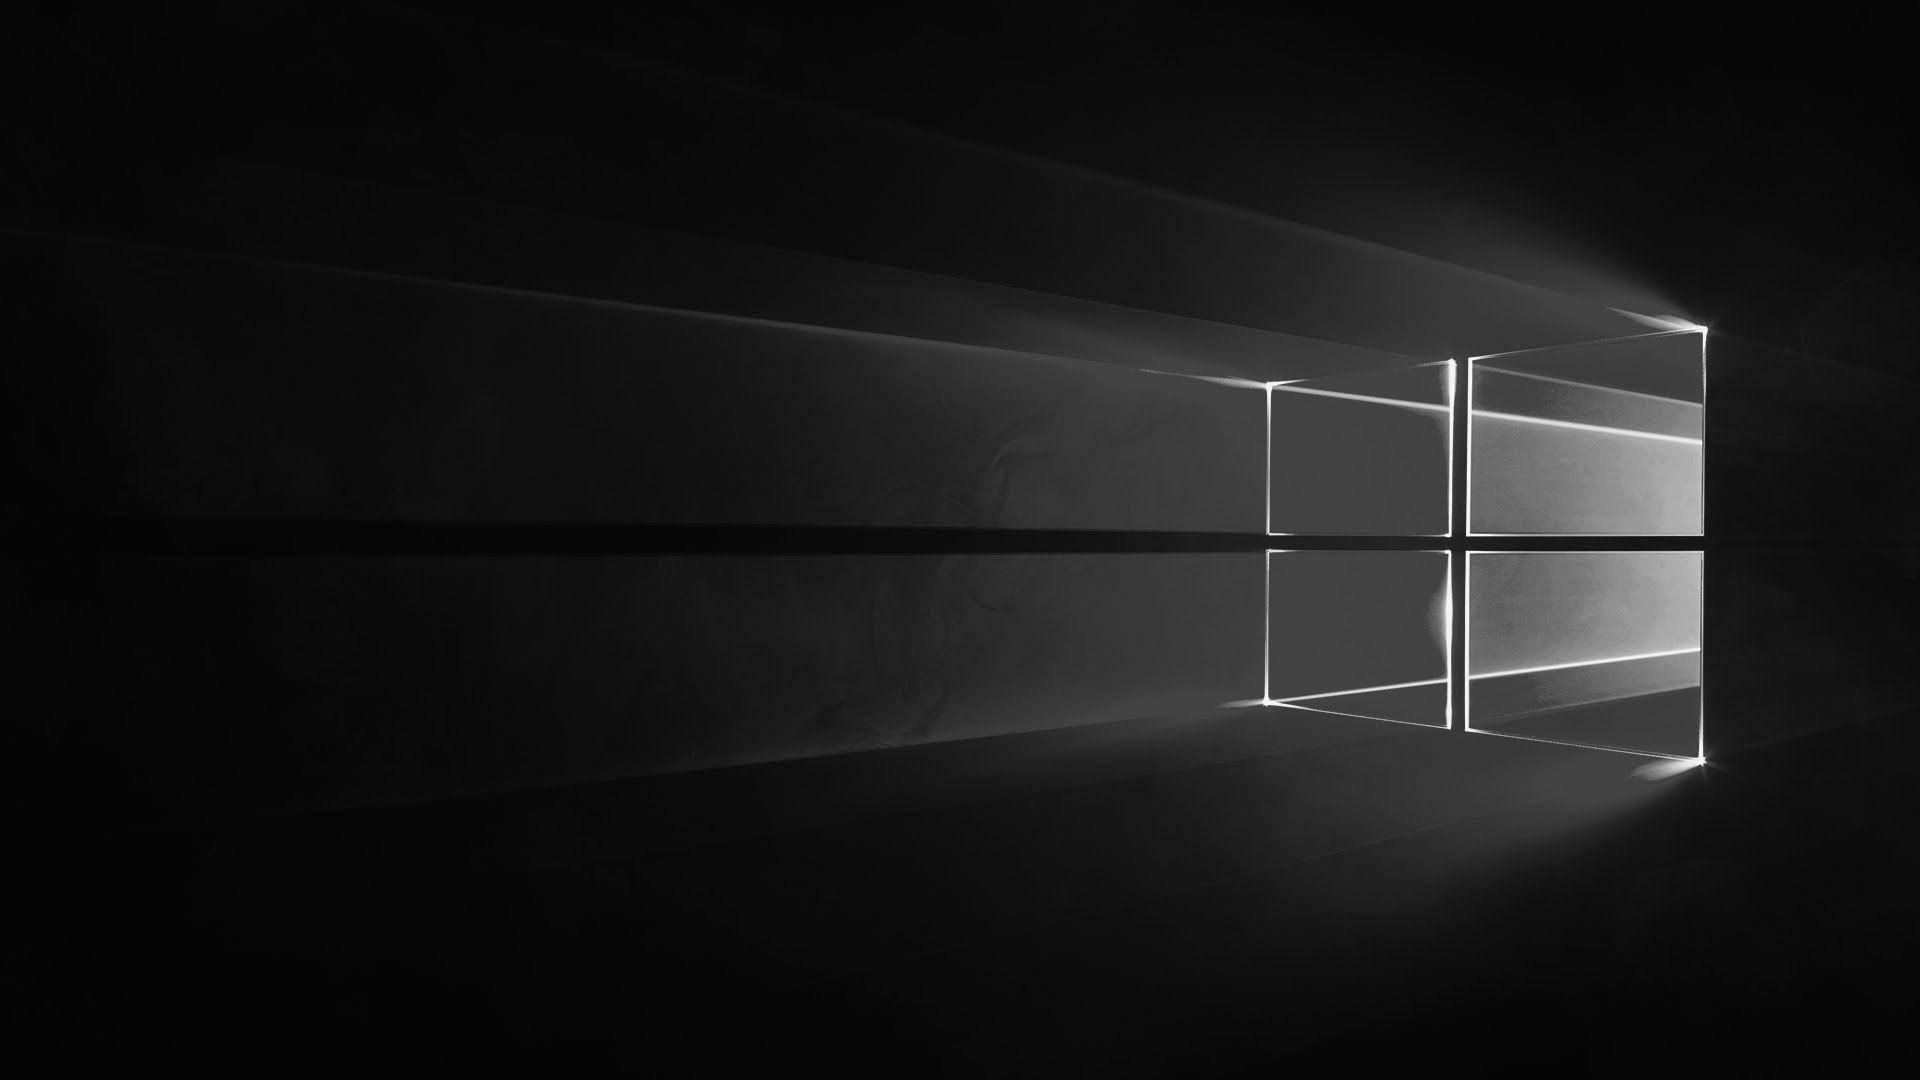 Black Windows Wallpaper Hd Black Hd Wallpaper Wallpaper Windows 10 Computer Wallpaper Desktop Wallpapers